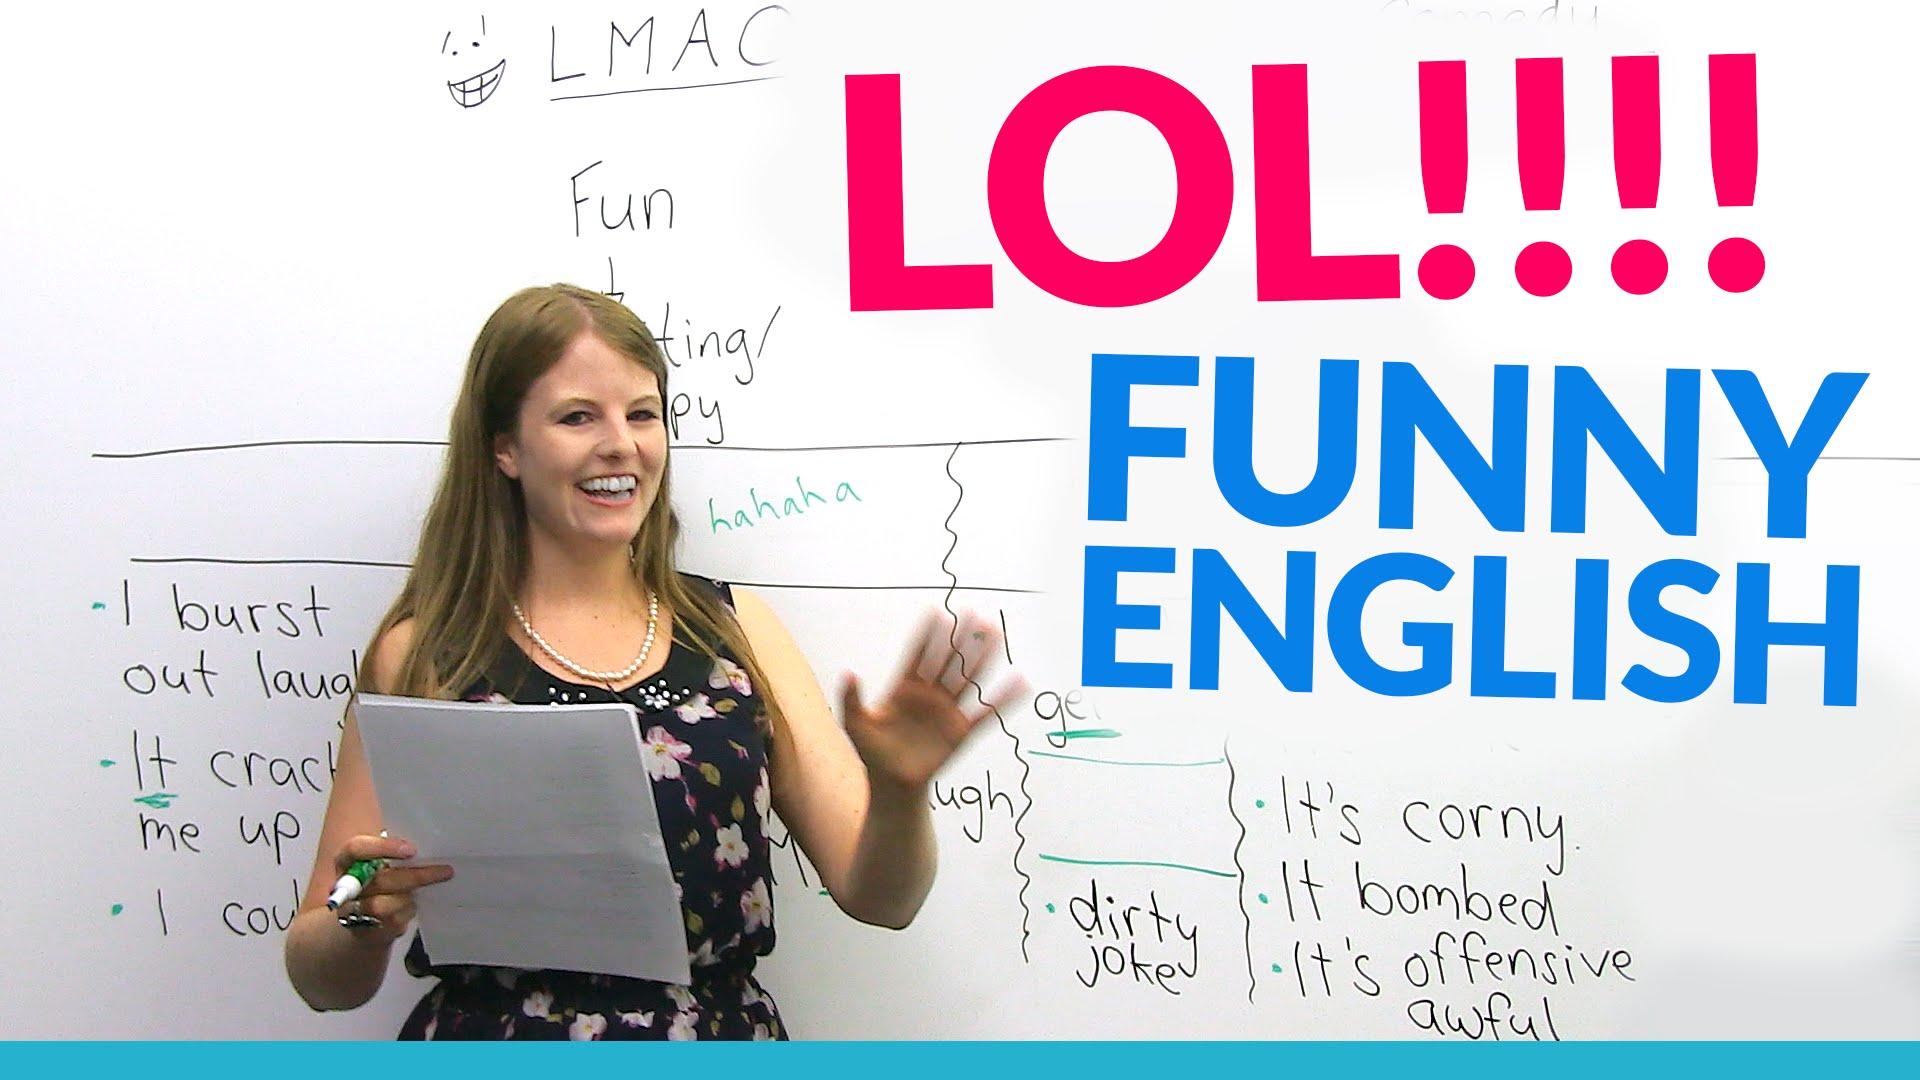 improve English speaking with hilarious jokes!